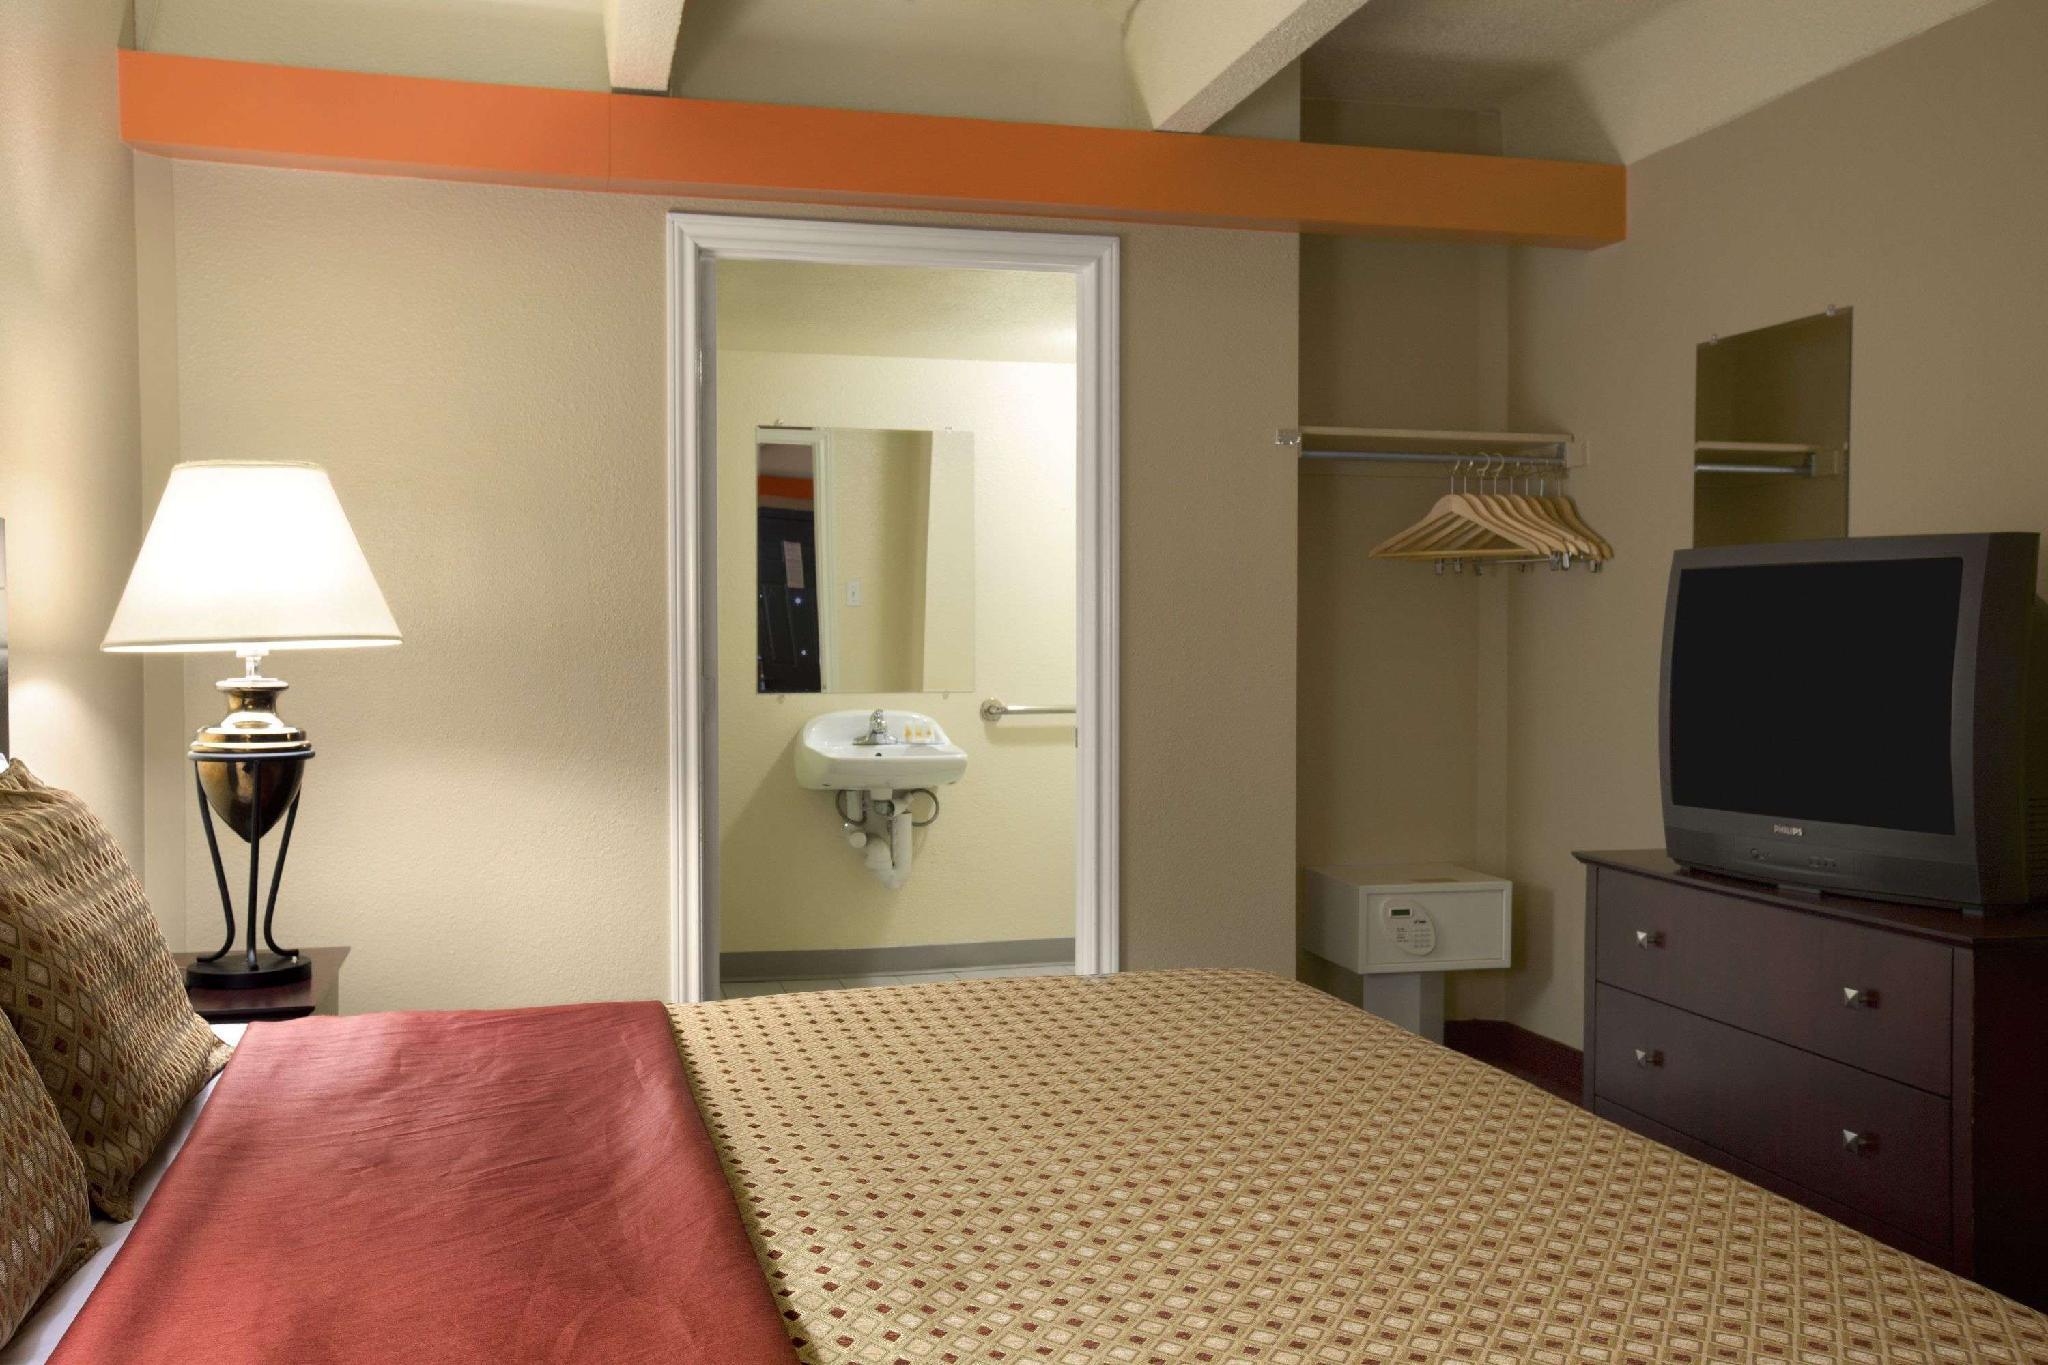 Days Inn By Wyndham Denver Downtown